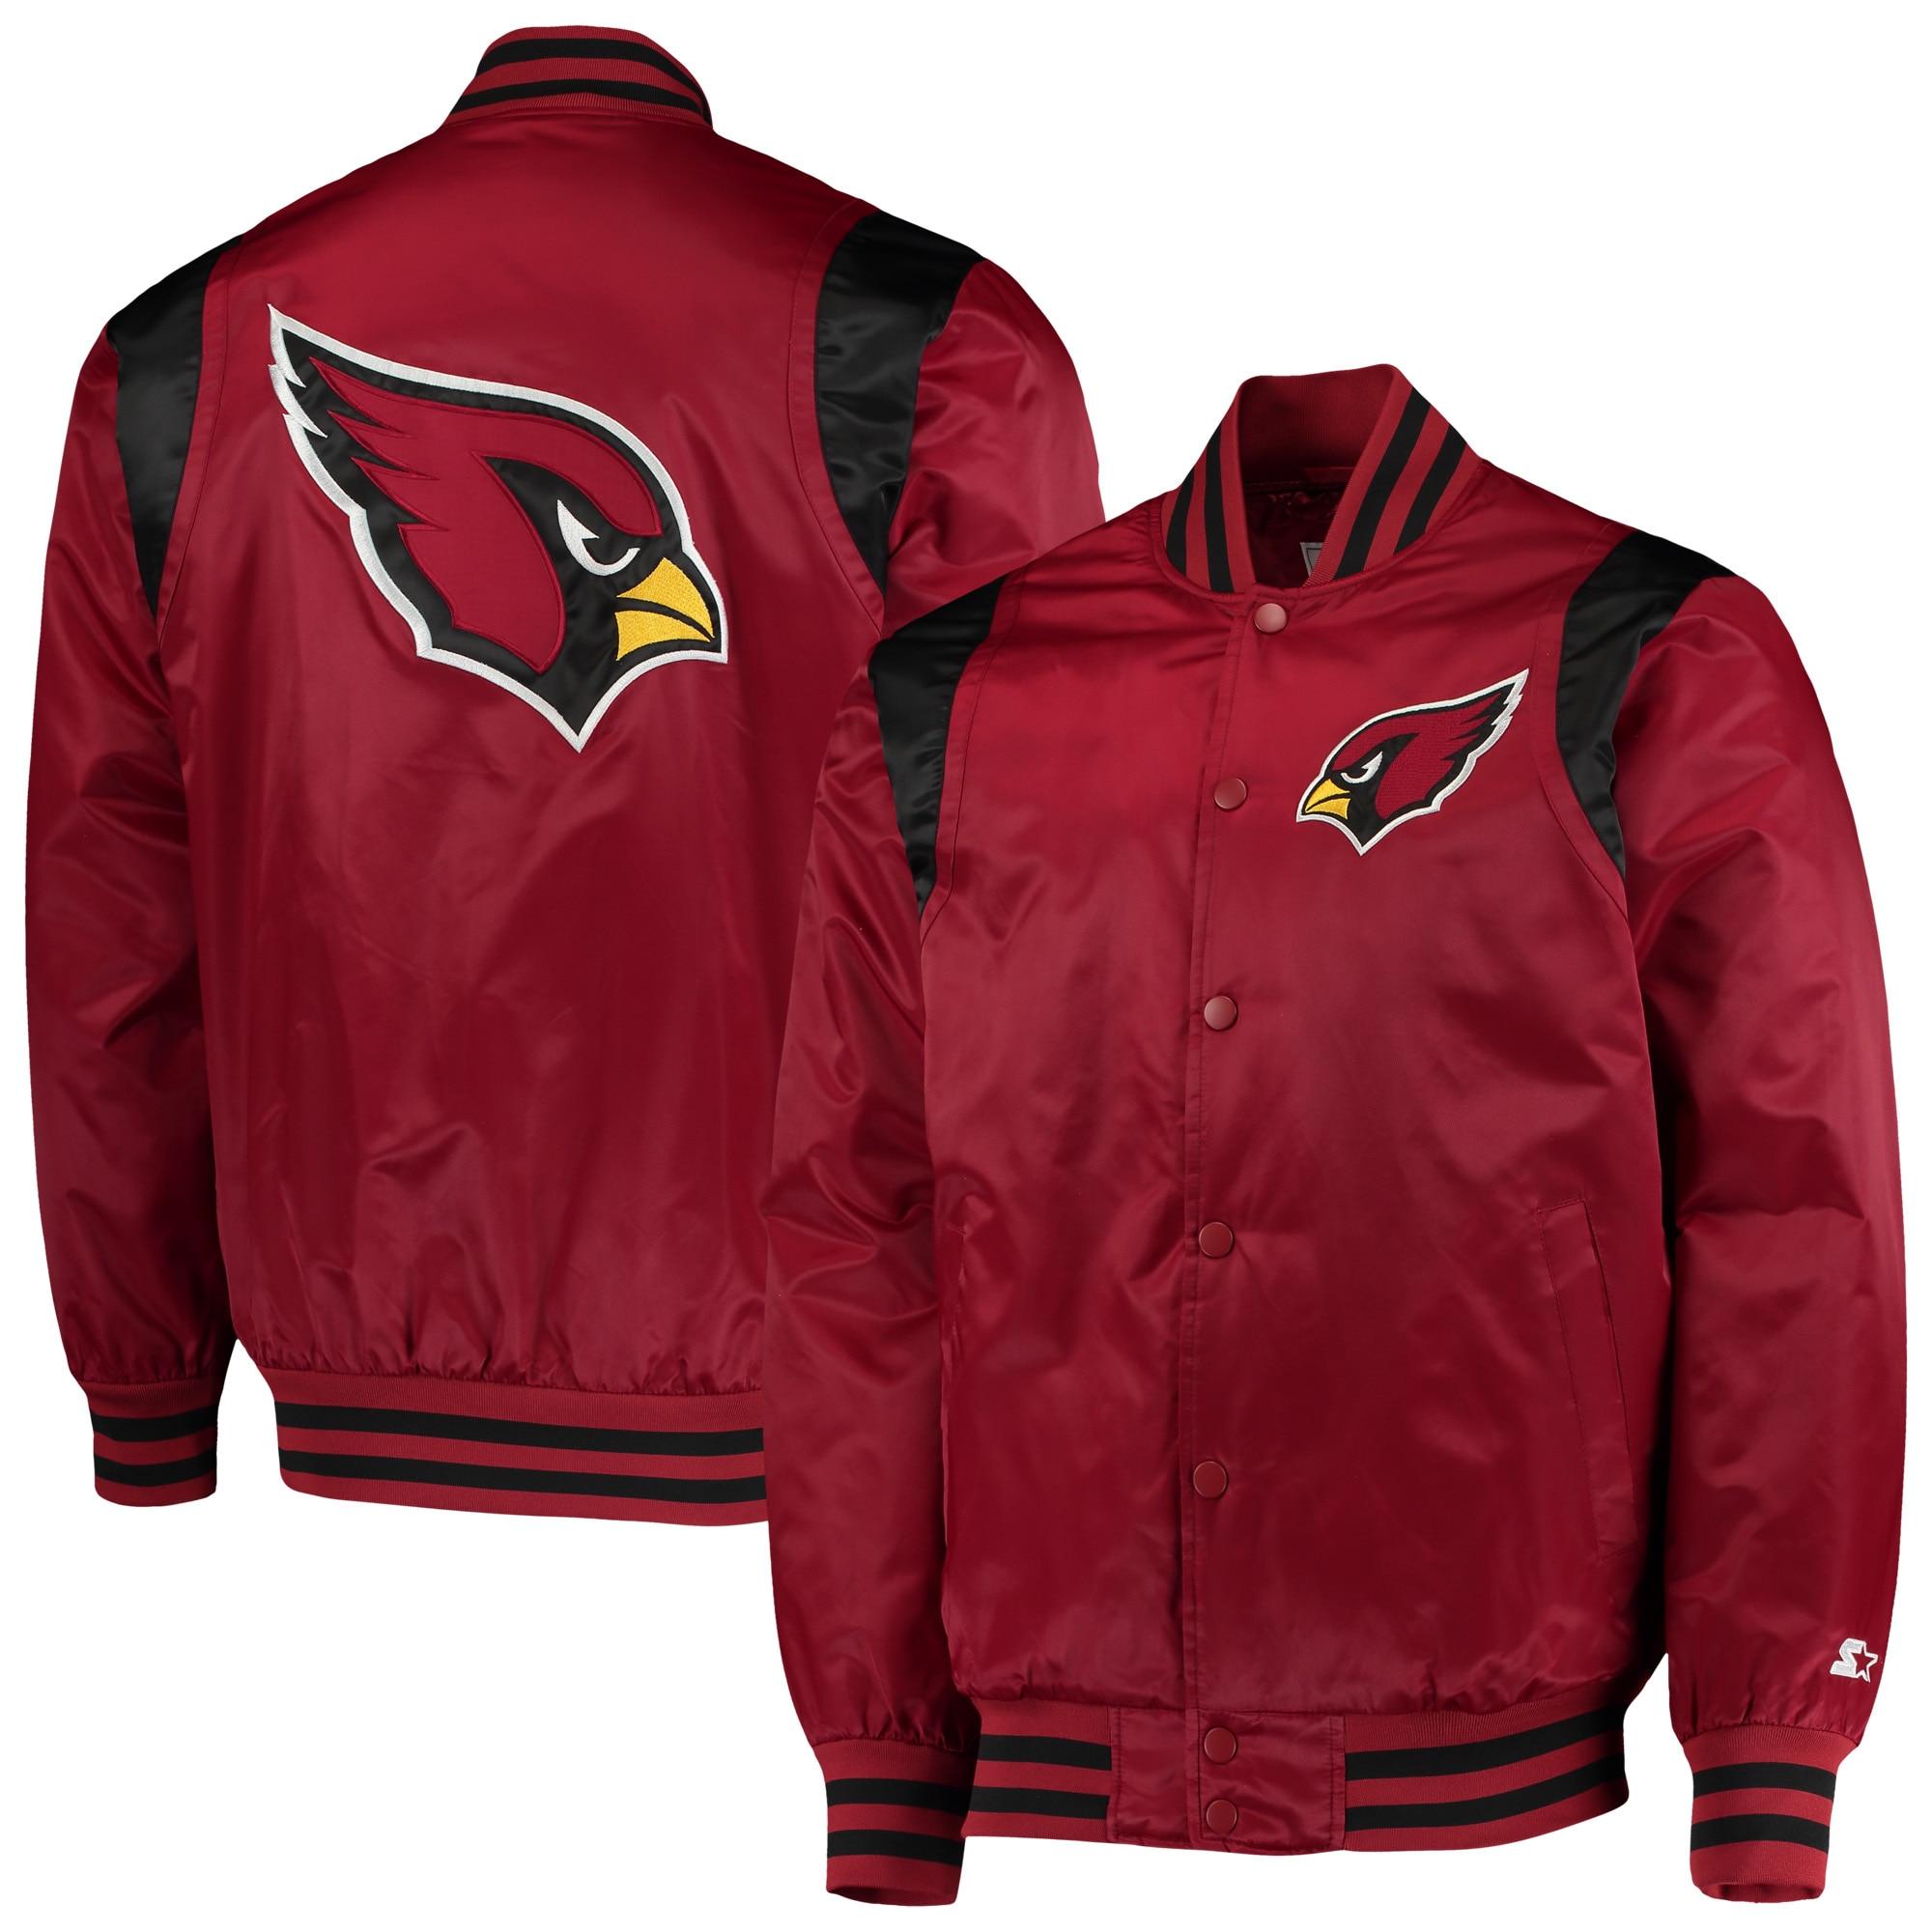 Arizona Cardinals Starter Prime Time Twill Satin Varsity Full-Snap Jacket - Cardinal/Black